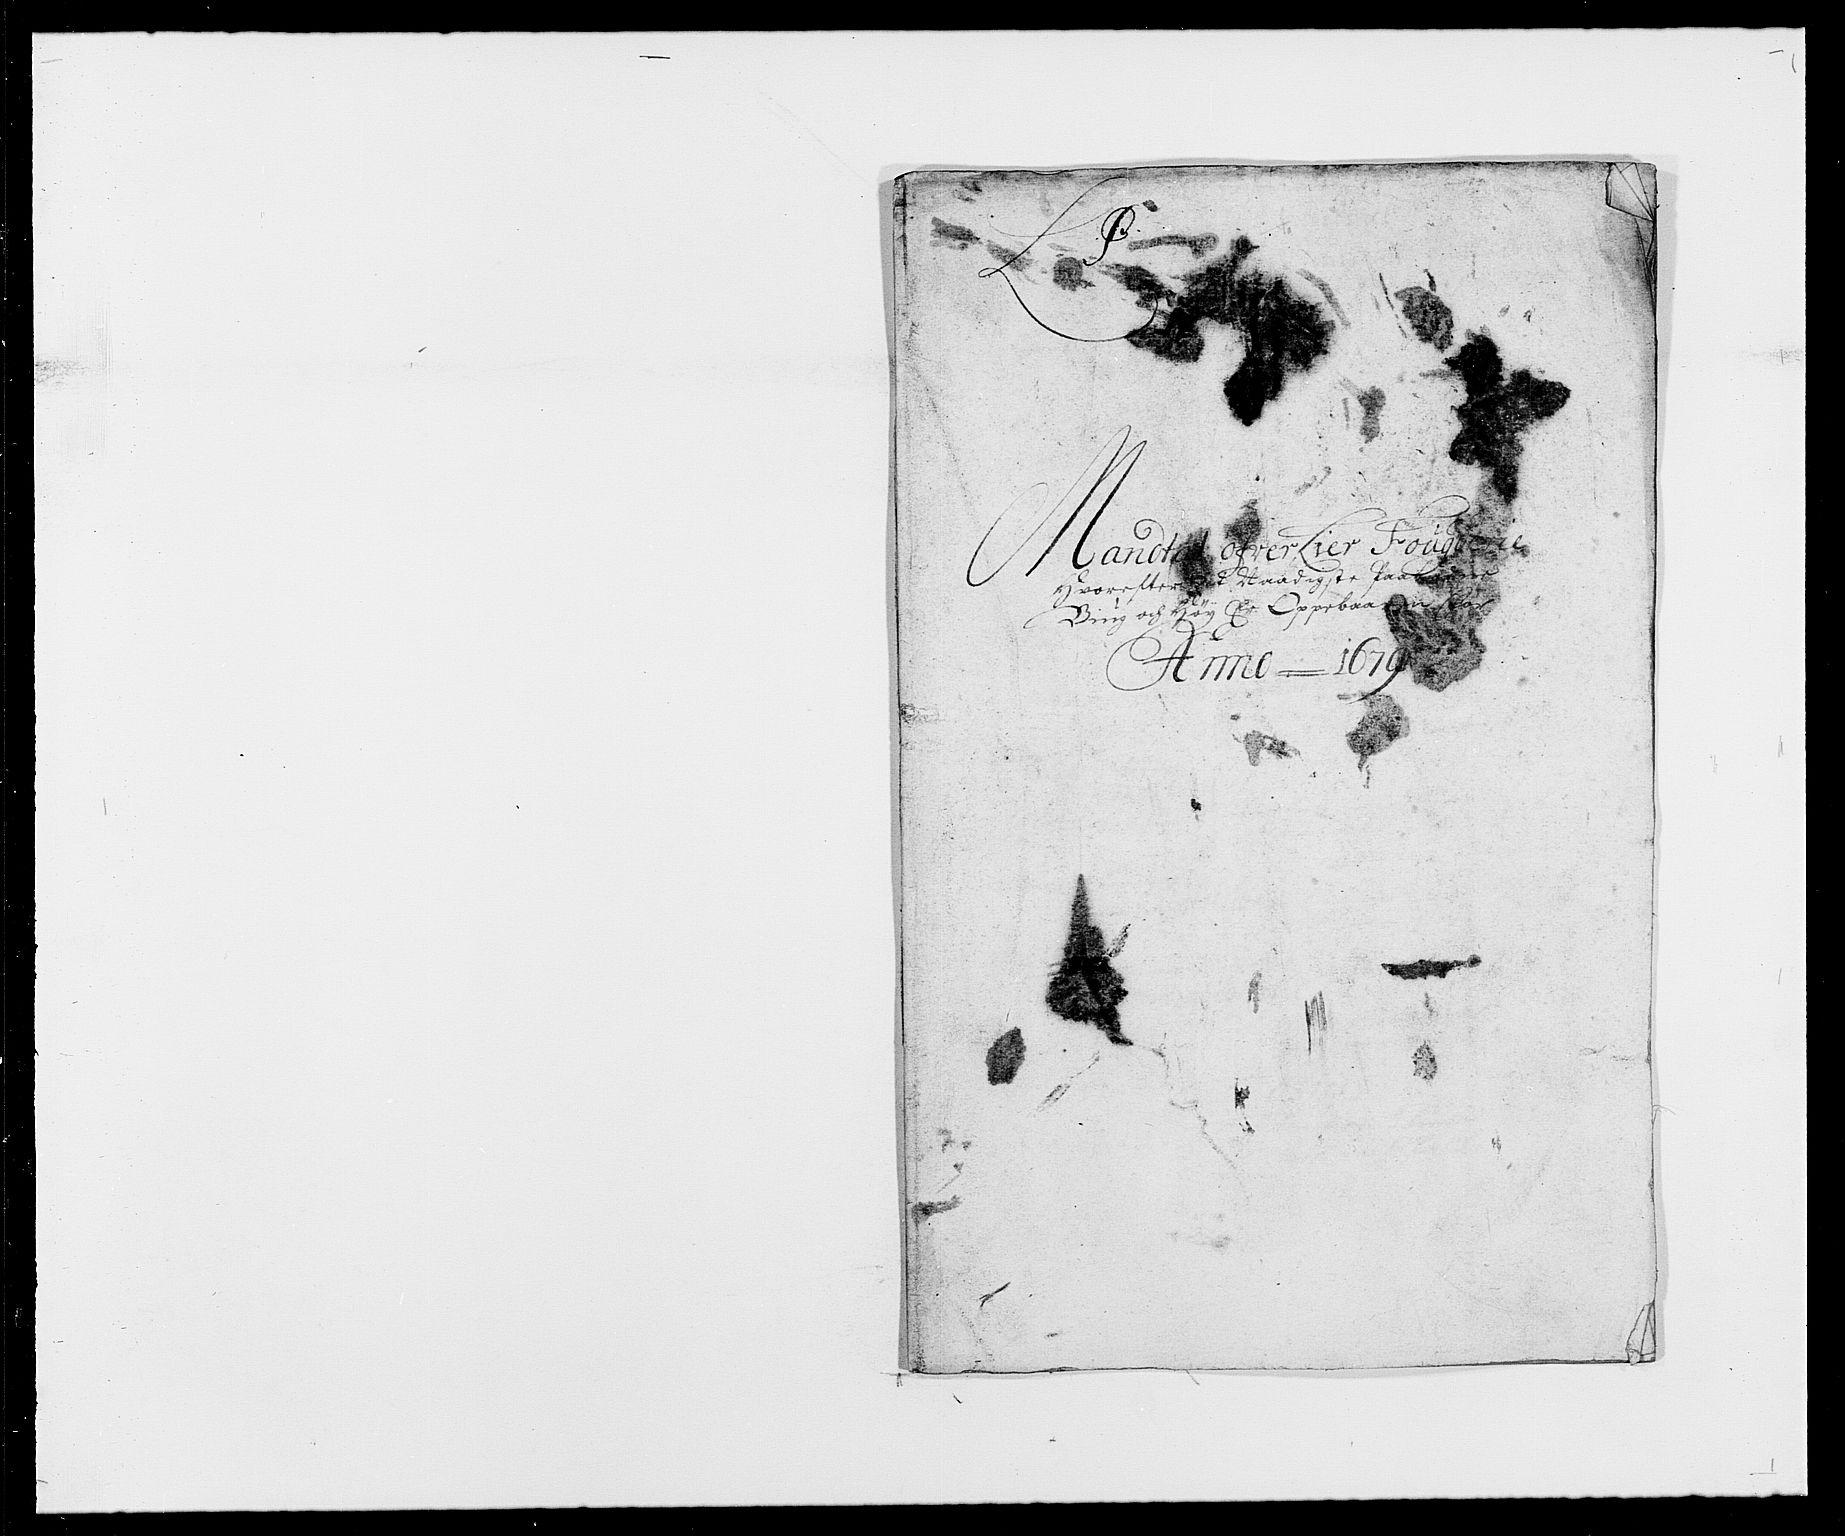 RA, Rentekammeret inntil 1814, Reviderte regnskaper, Fogderegnskap, R27/L1686: Fogderegnskap Lier, 1678-1686, s. 185